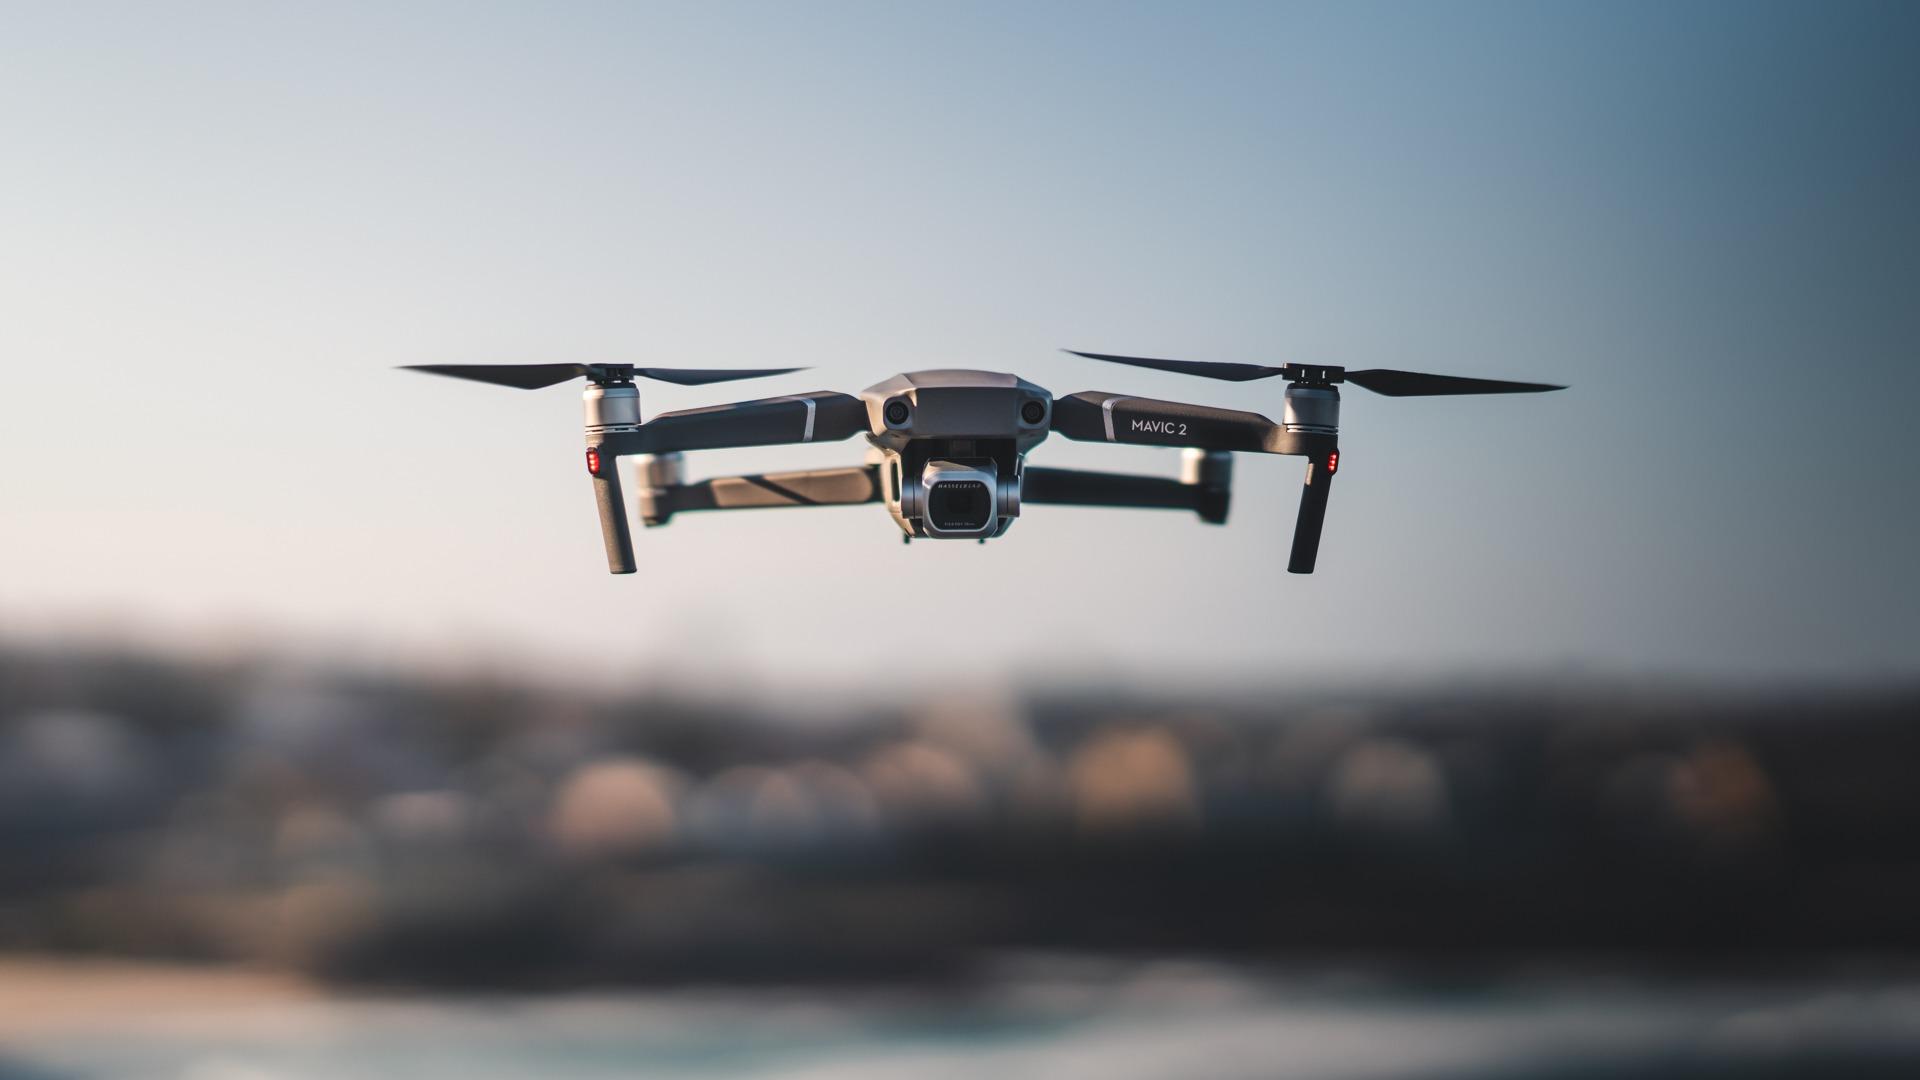 Drone Mavic Pro 2 - 1920x1080 - Download HD Wallpaper - WallpaperTip